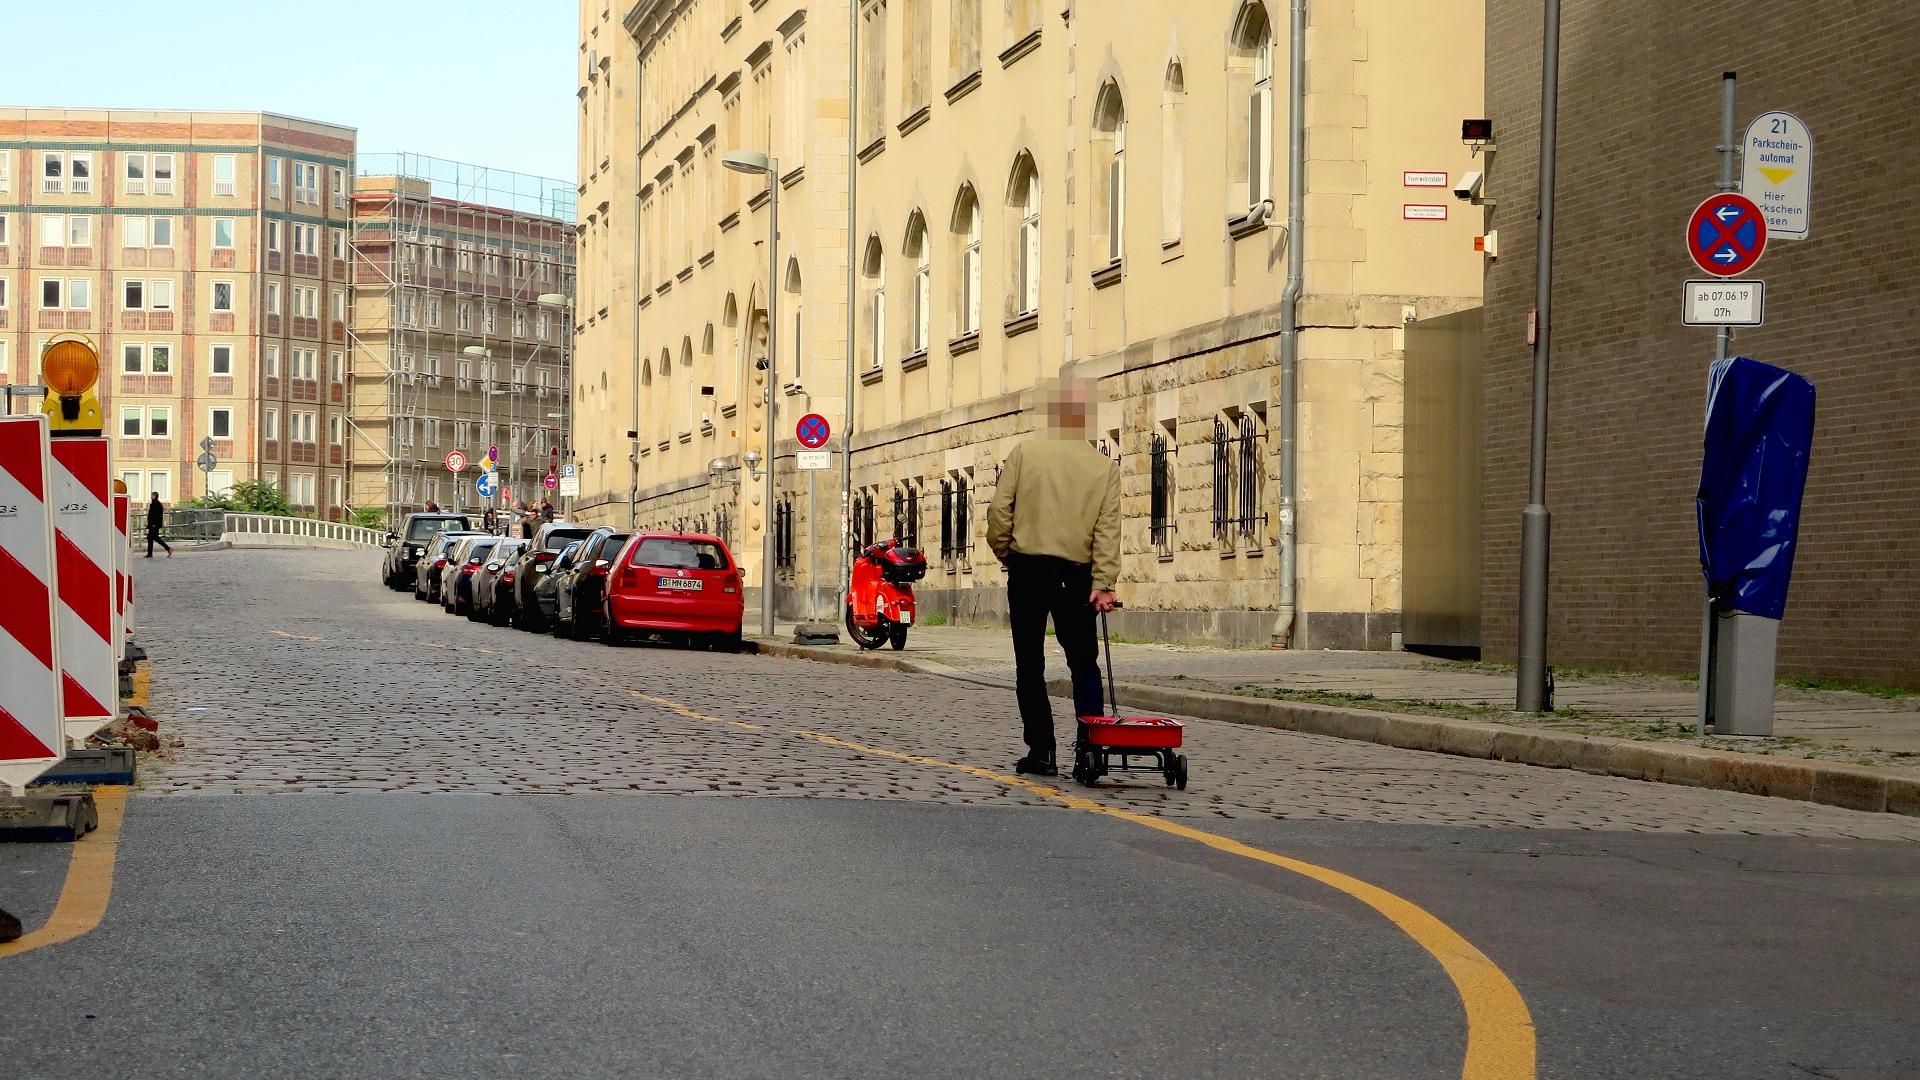 Berliner Künstler trickst Google Maps aus & erzeugt virtuellen Stau